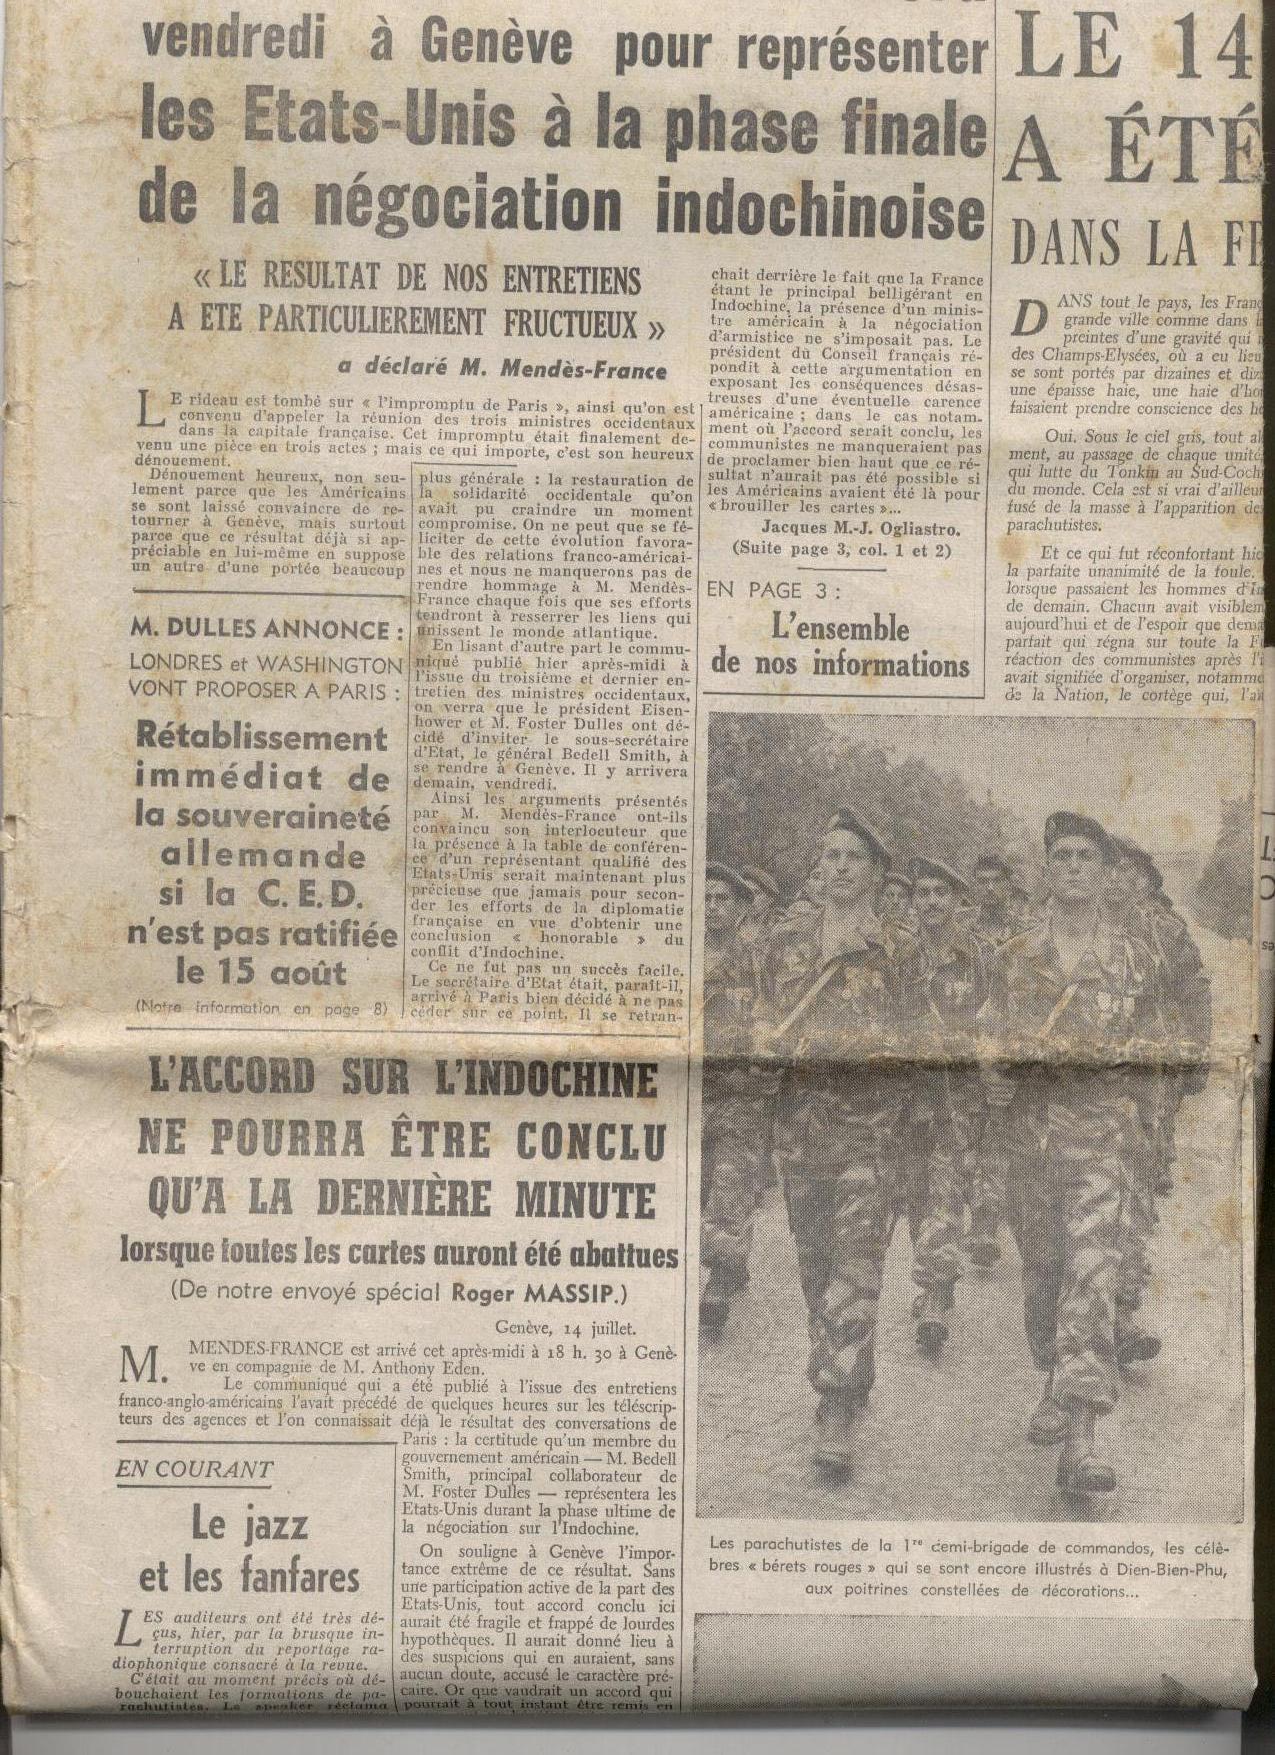 6- Le Figaro du 15 juillet 1954